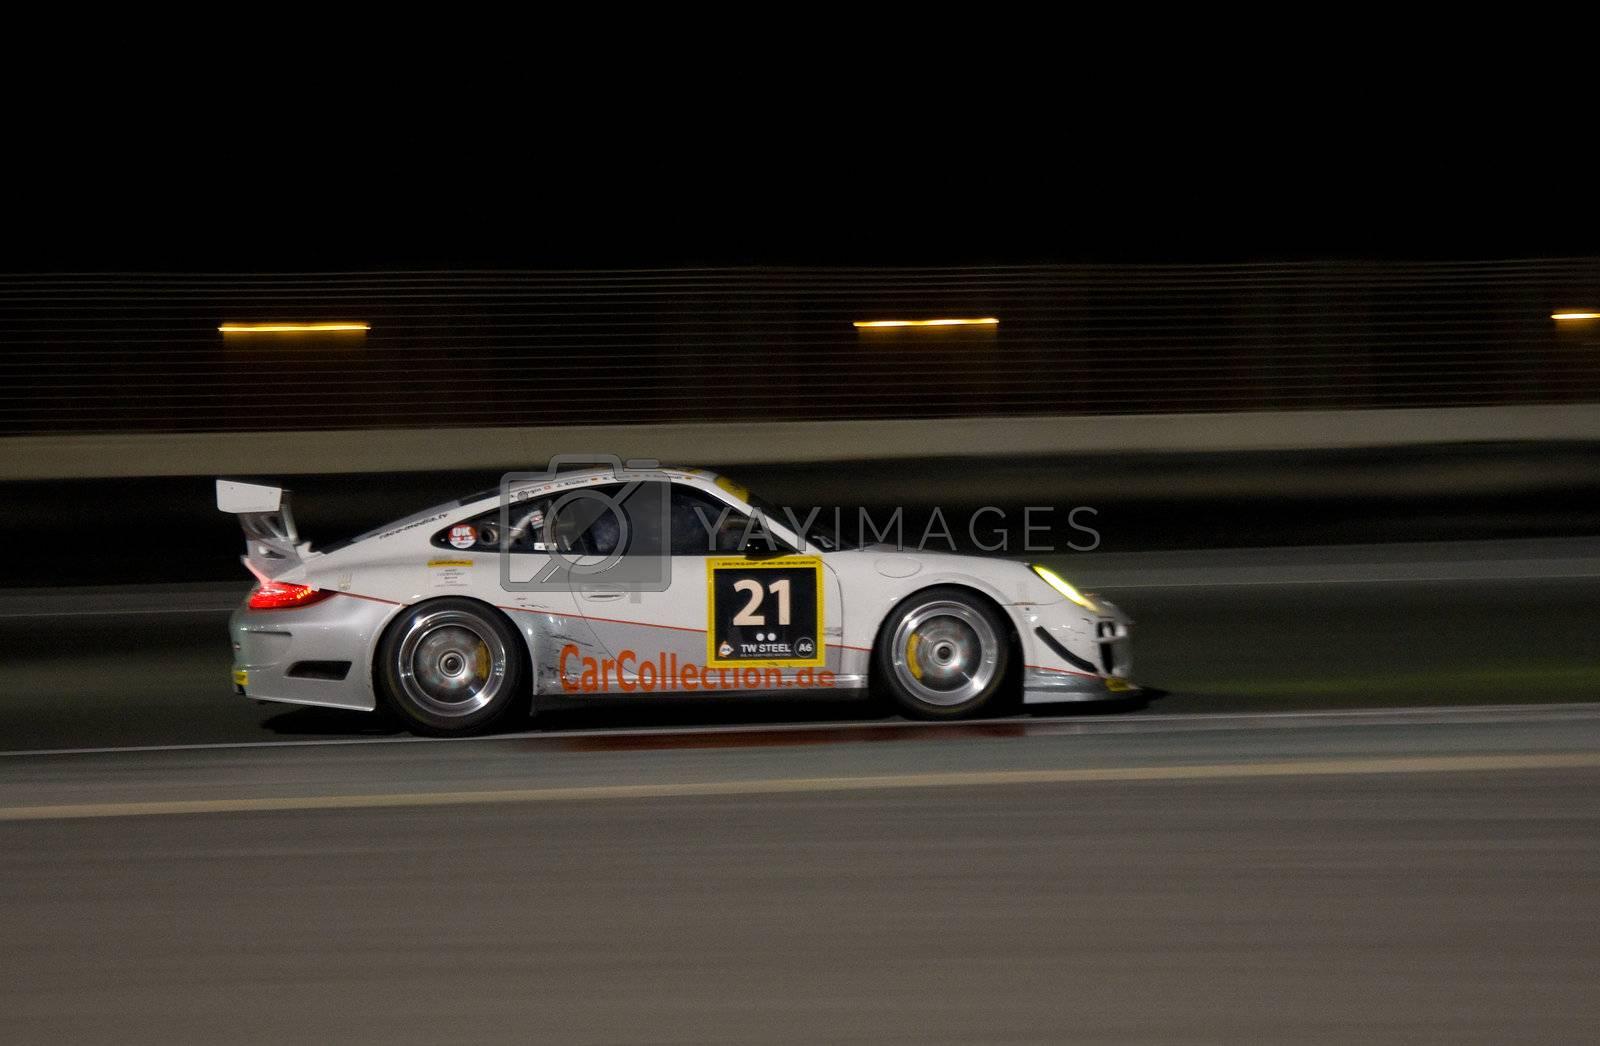 DUBAI - JANUARY 13: Car 21, a Porsche 997 GT3 Cup at night during the 2012 Dunlop 24 Hour Race at Dubai Autodrome on January 13, 2012.